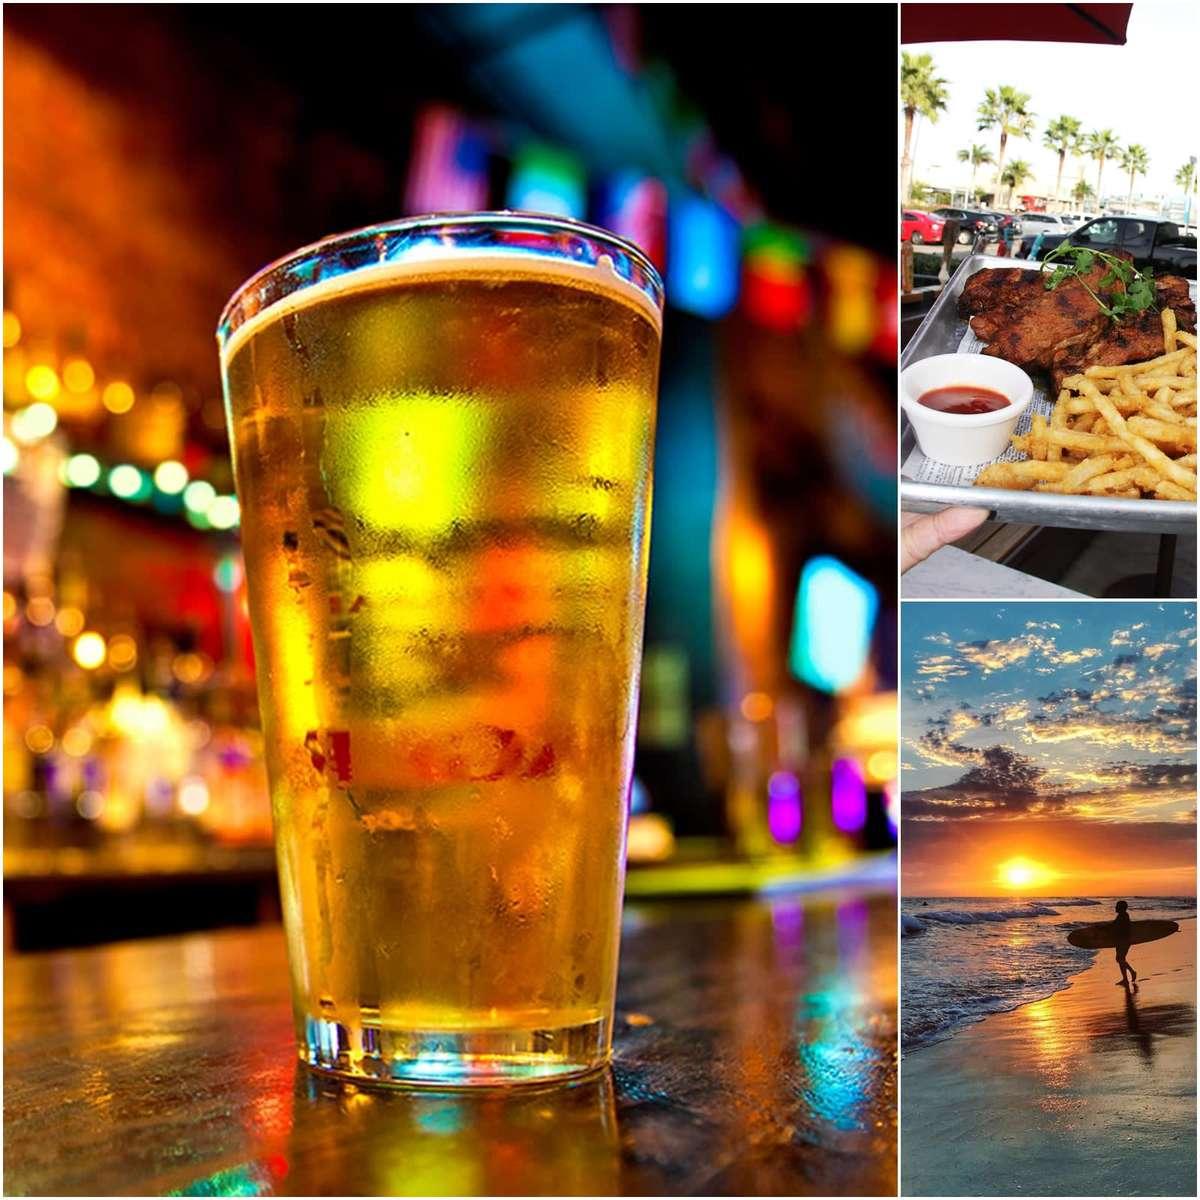 Good Beer, Good Food, Good View - Asian Fusion Restaurant & Bar